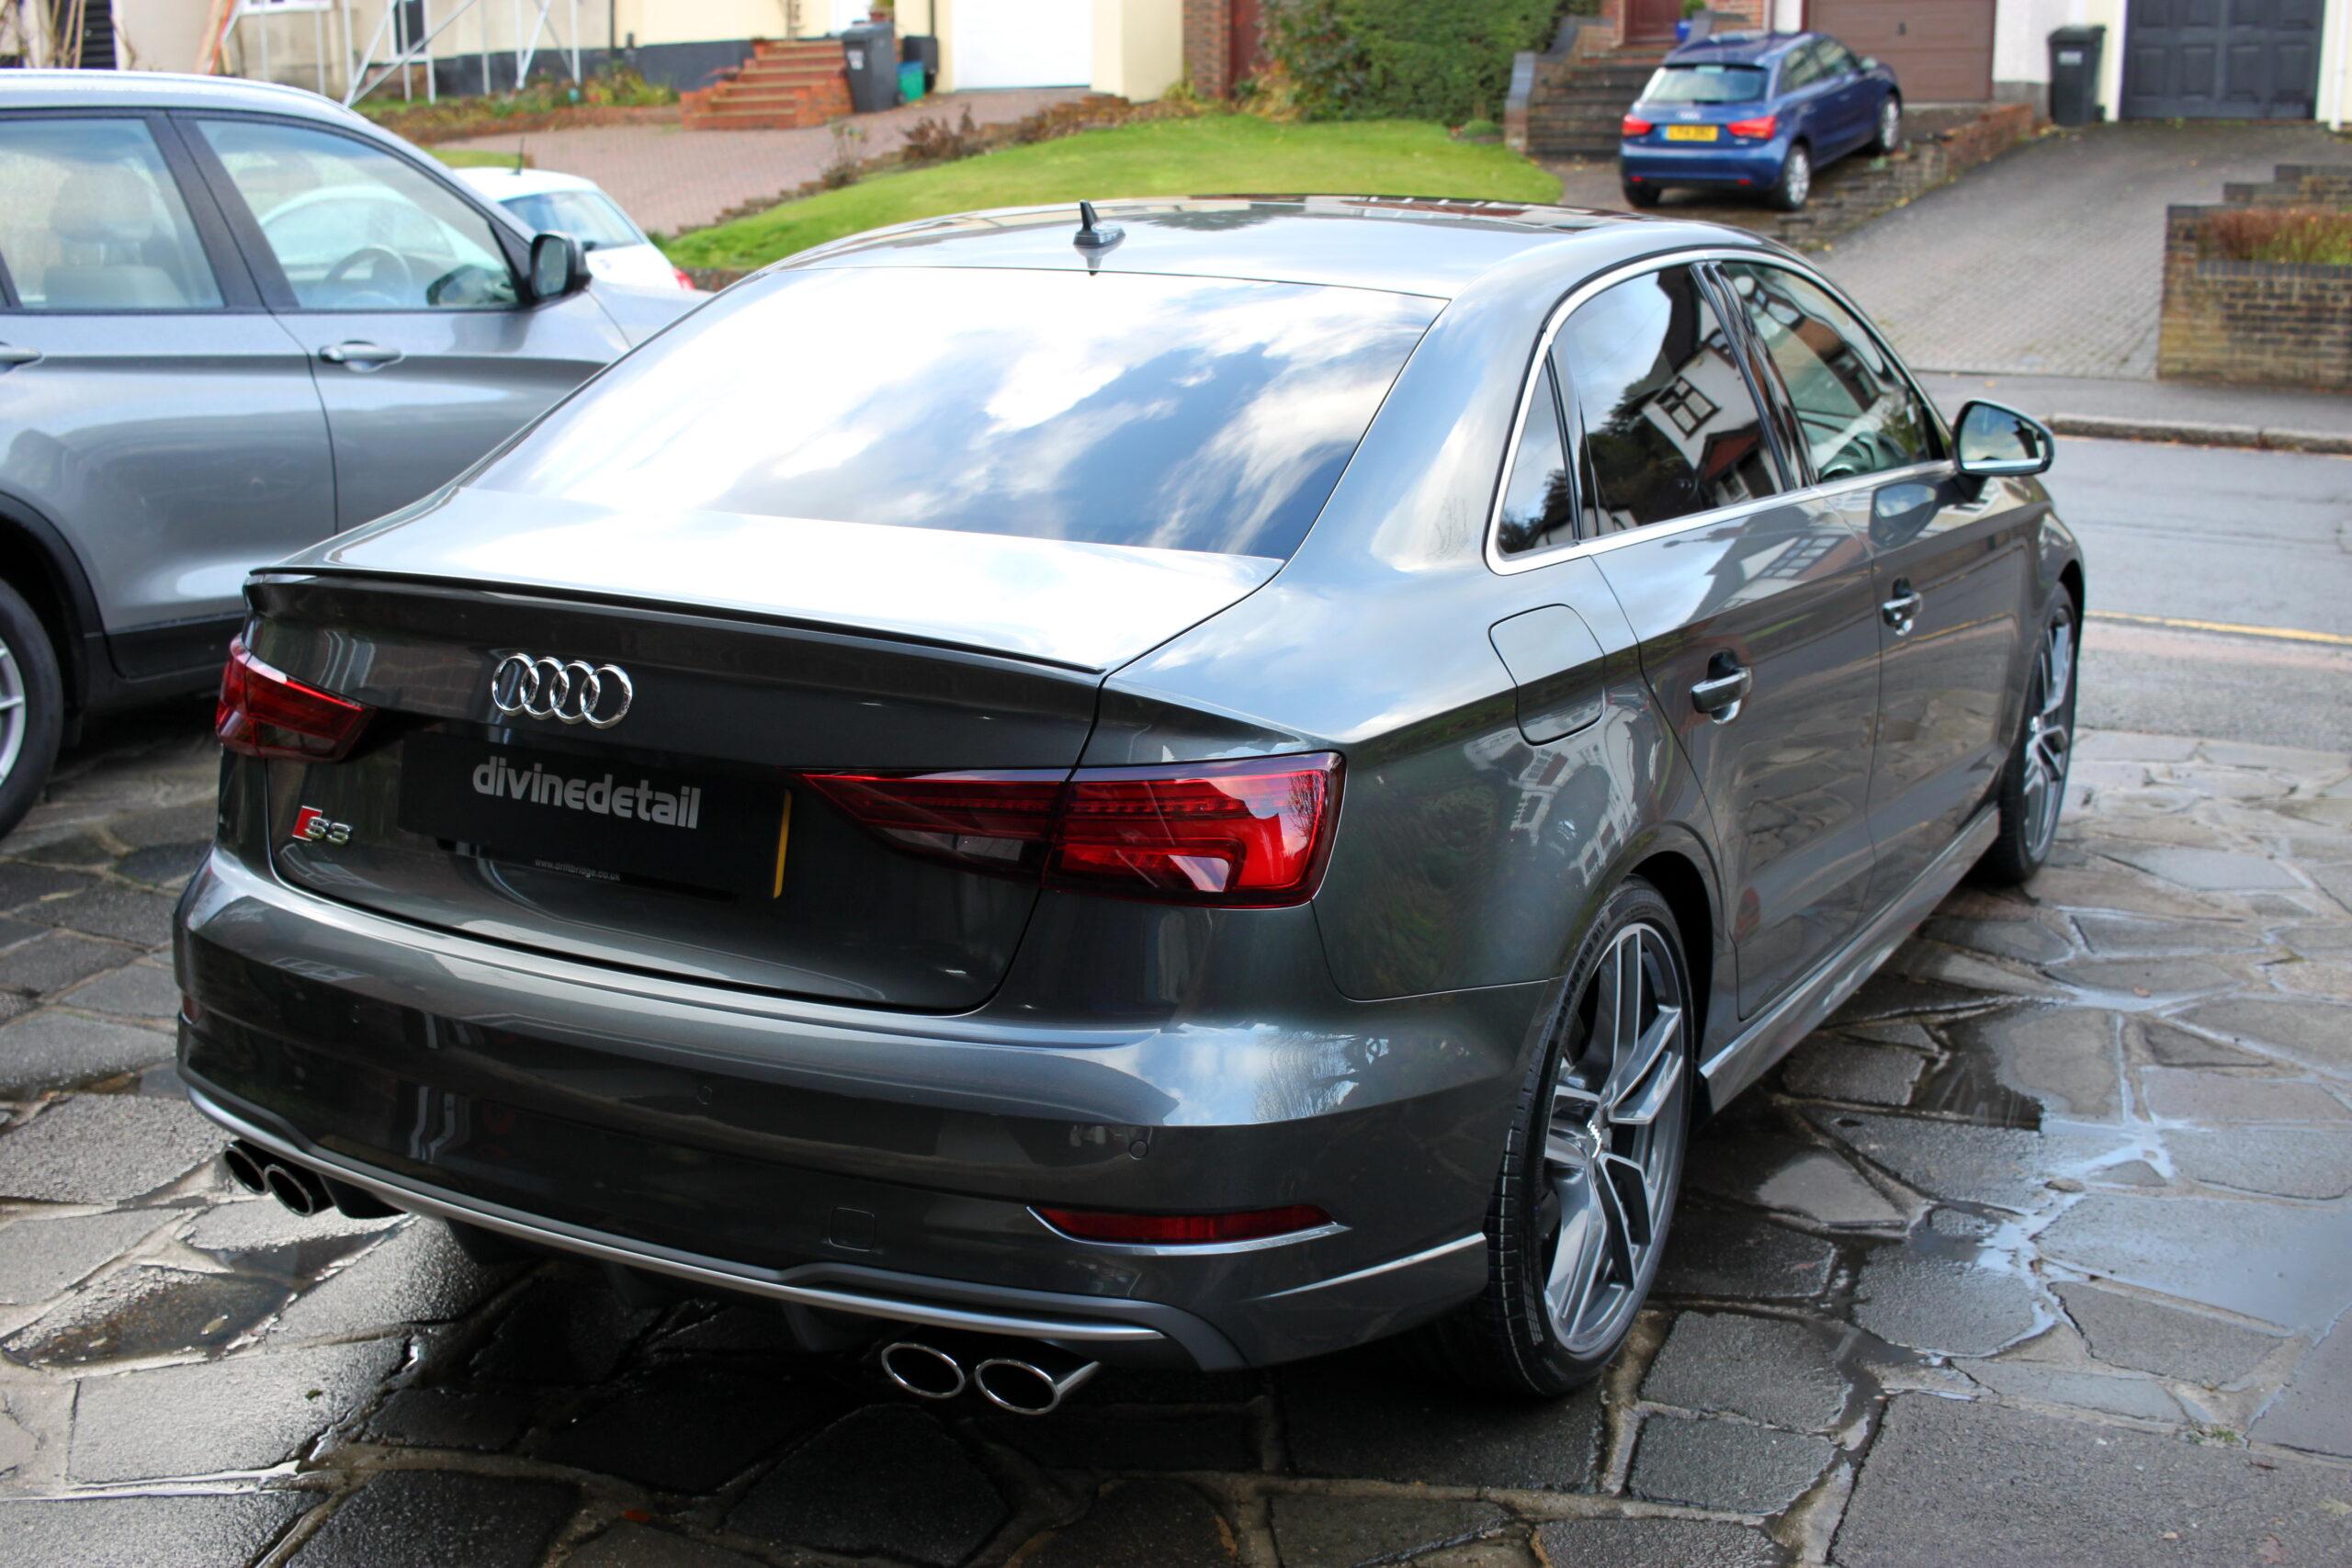 Audi S3 New car detail